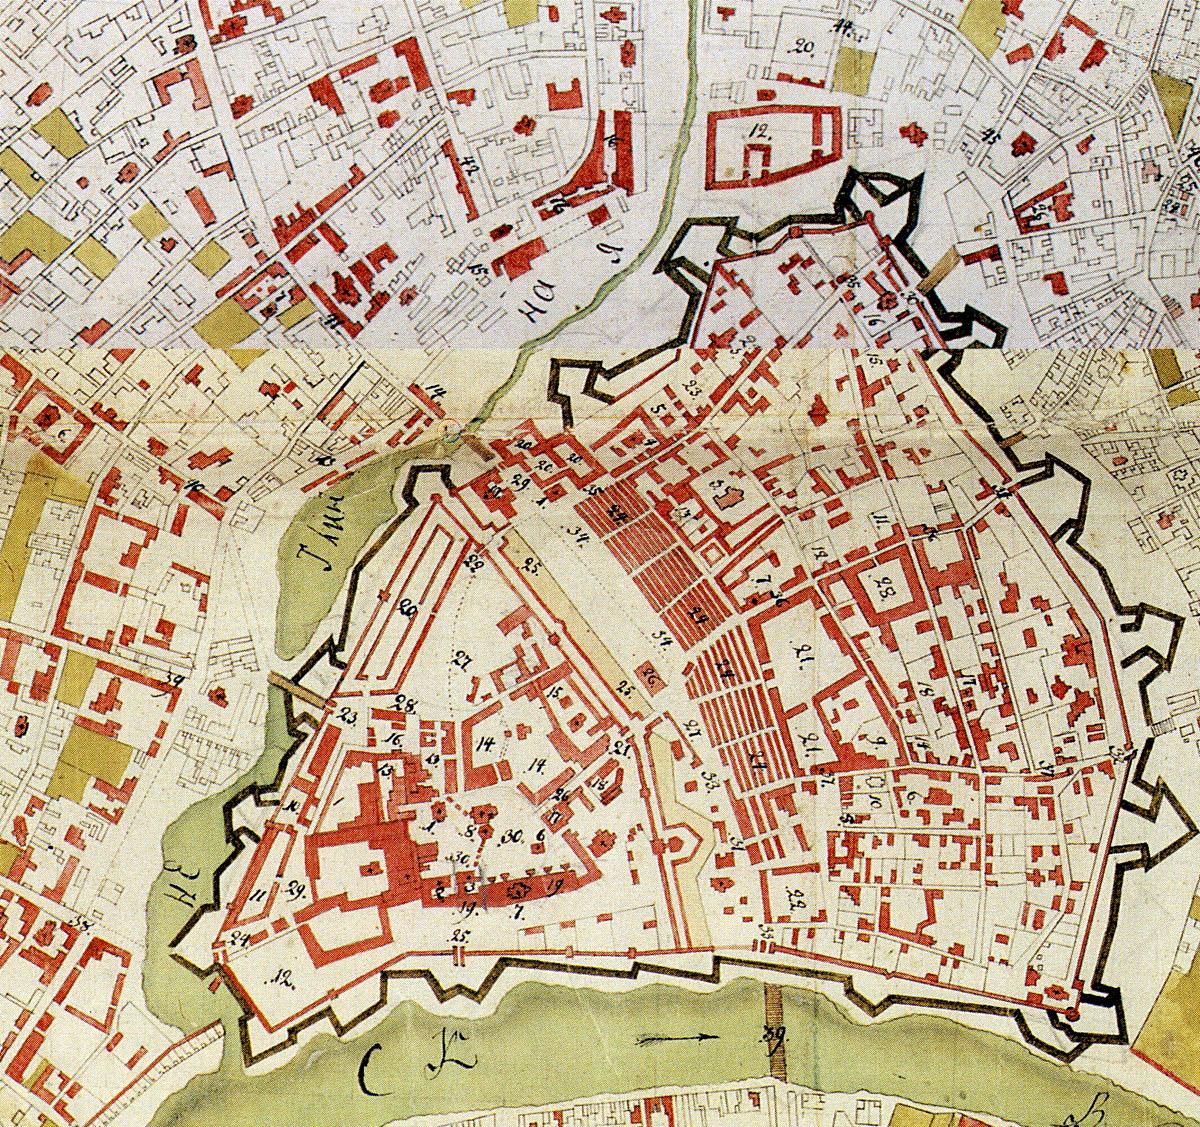 Kremlin Map File:Moscow Kre...